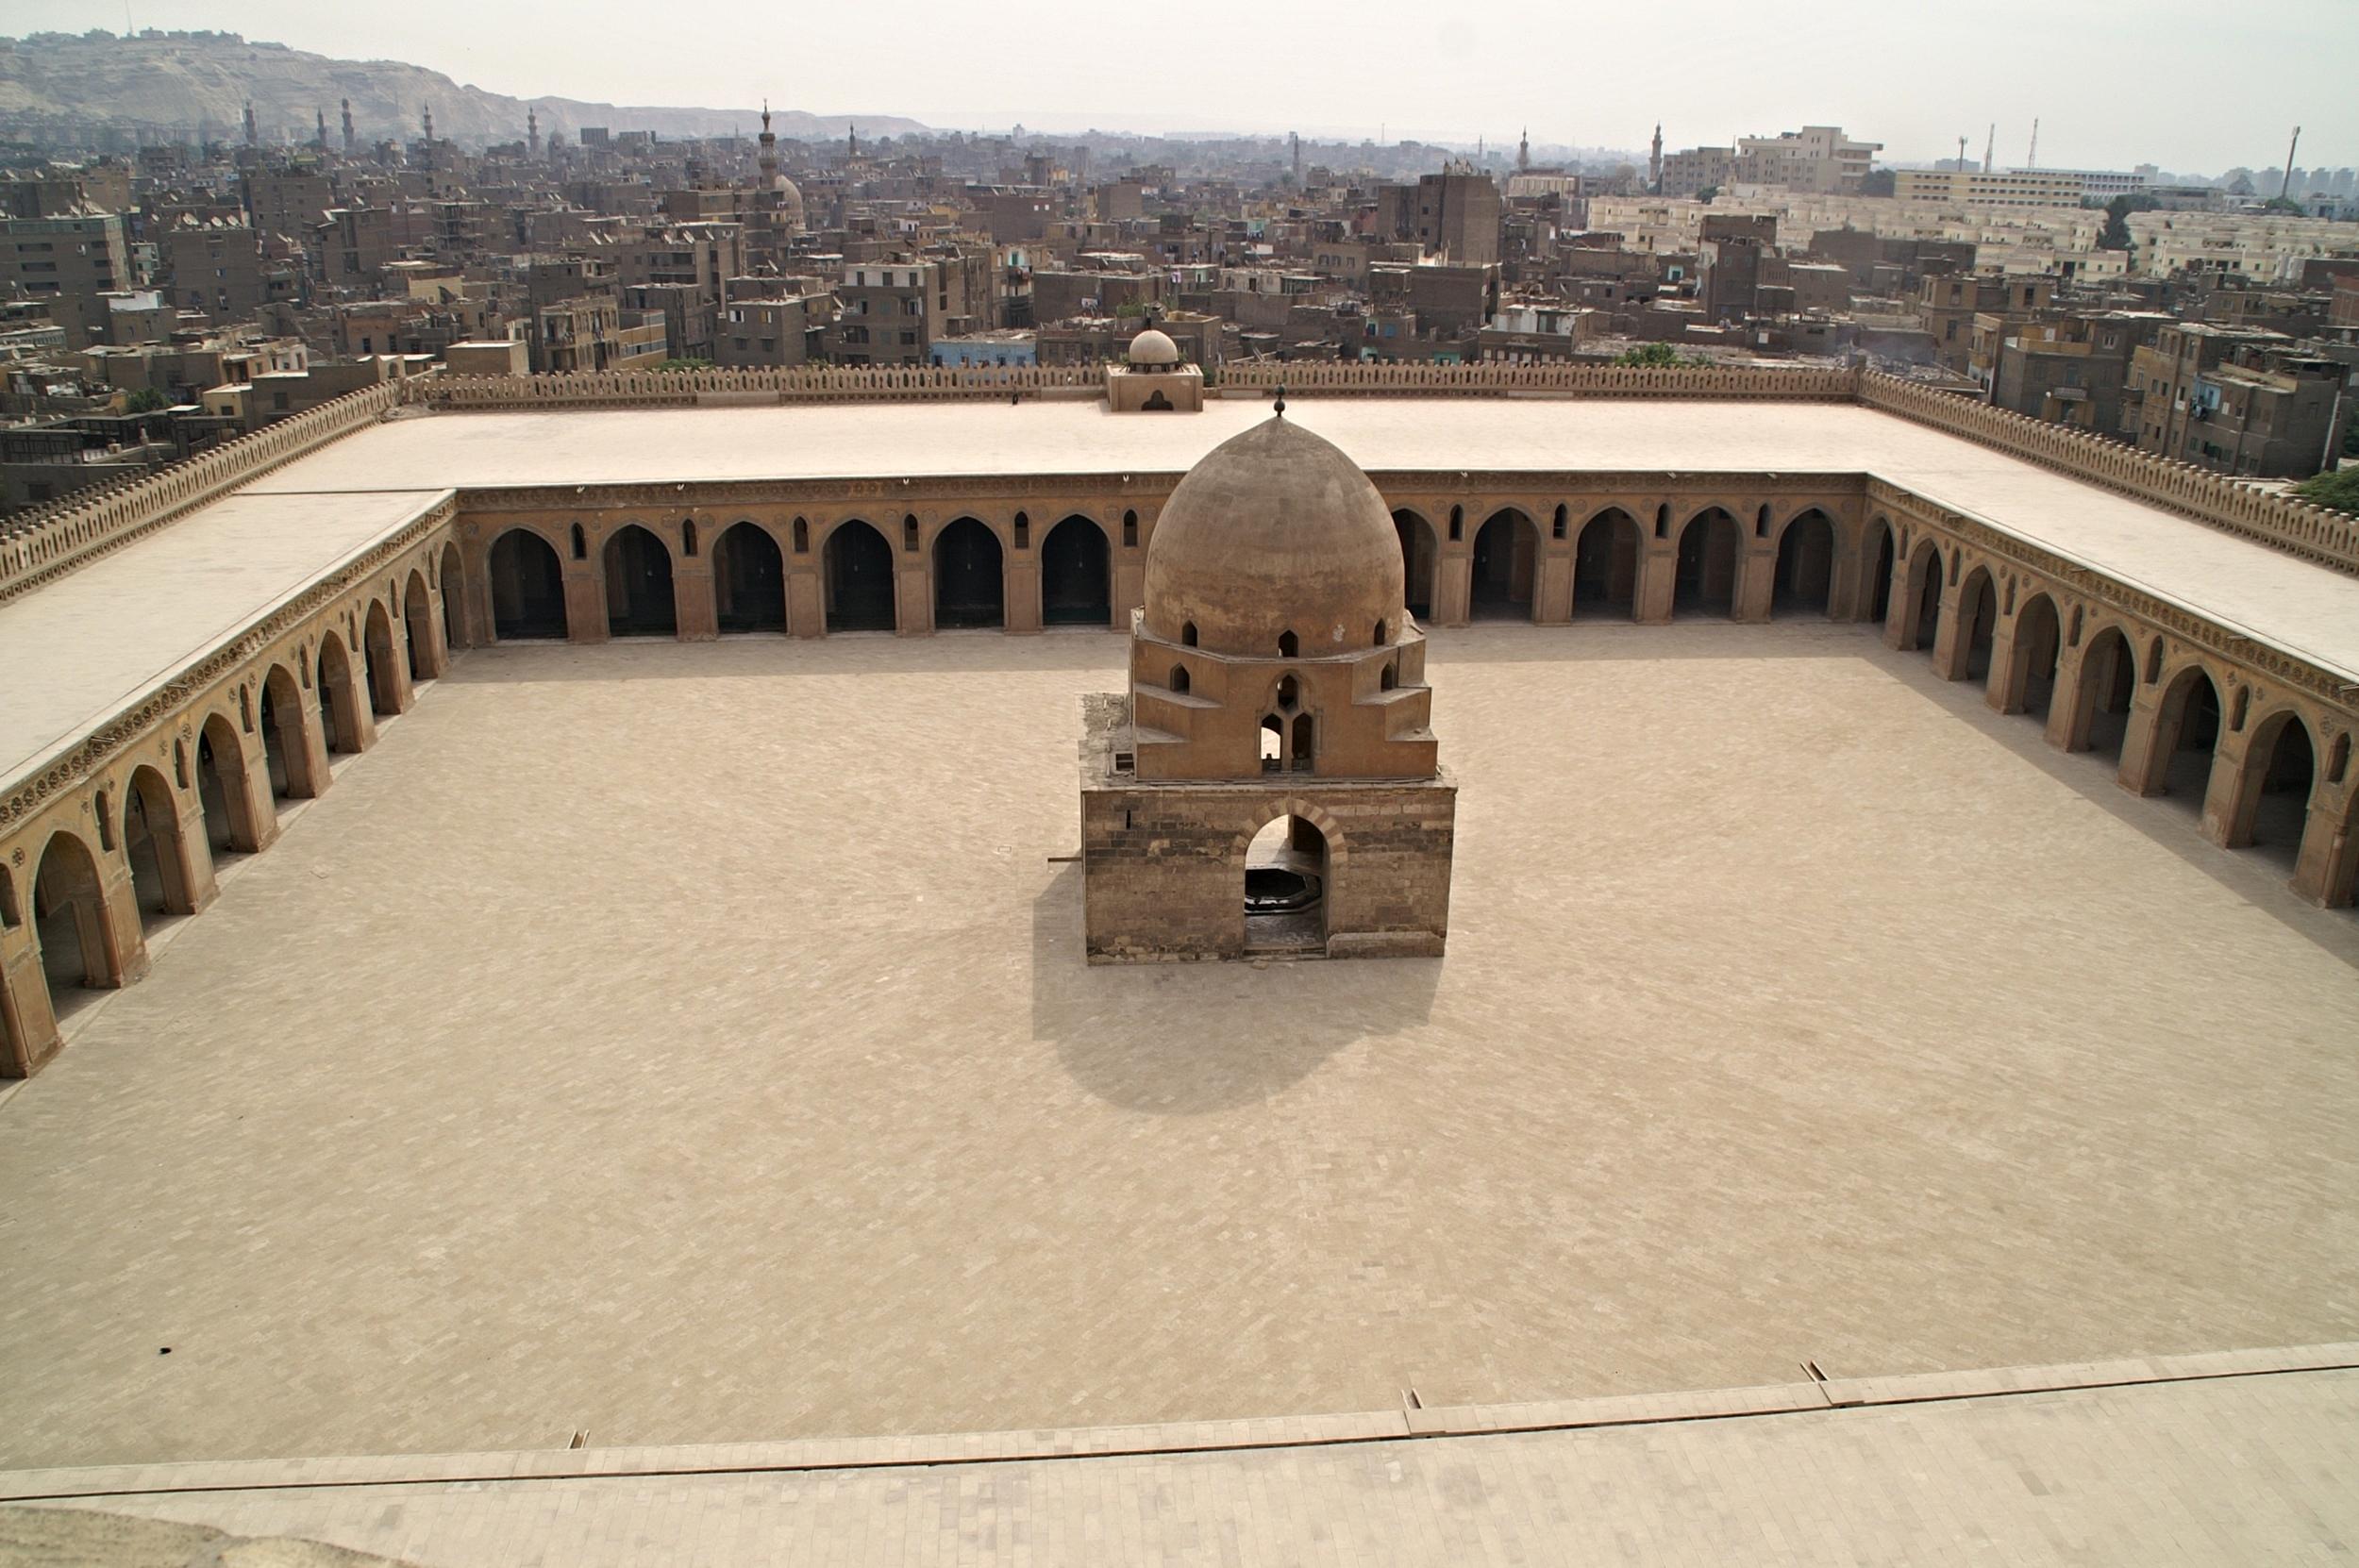 The Mosque of Ahmad Ibn Tulun